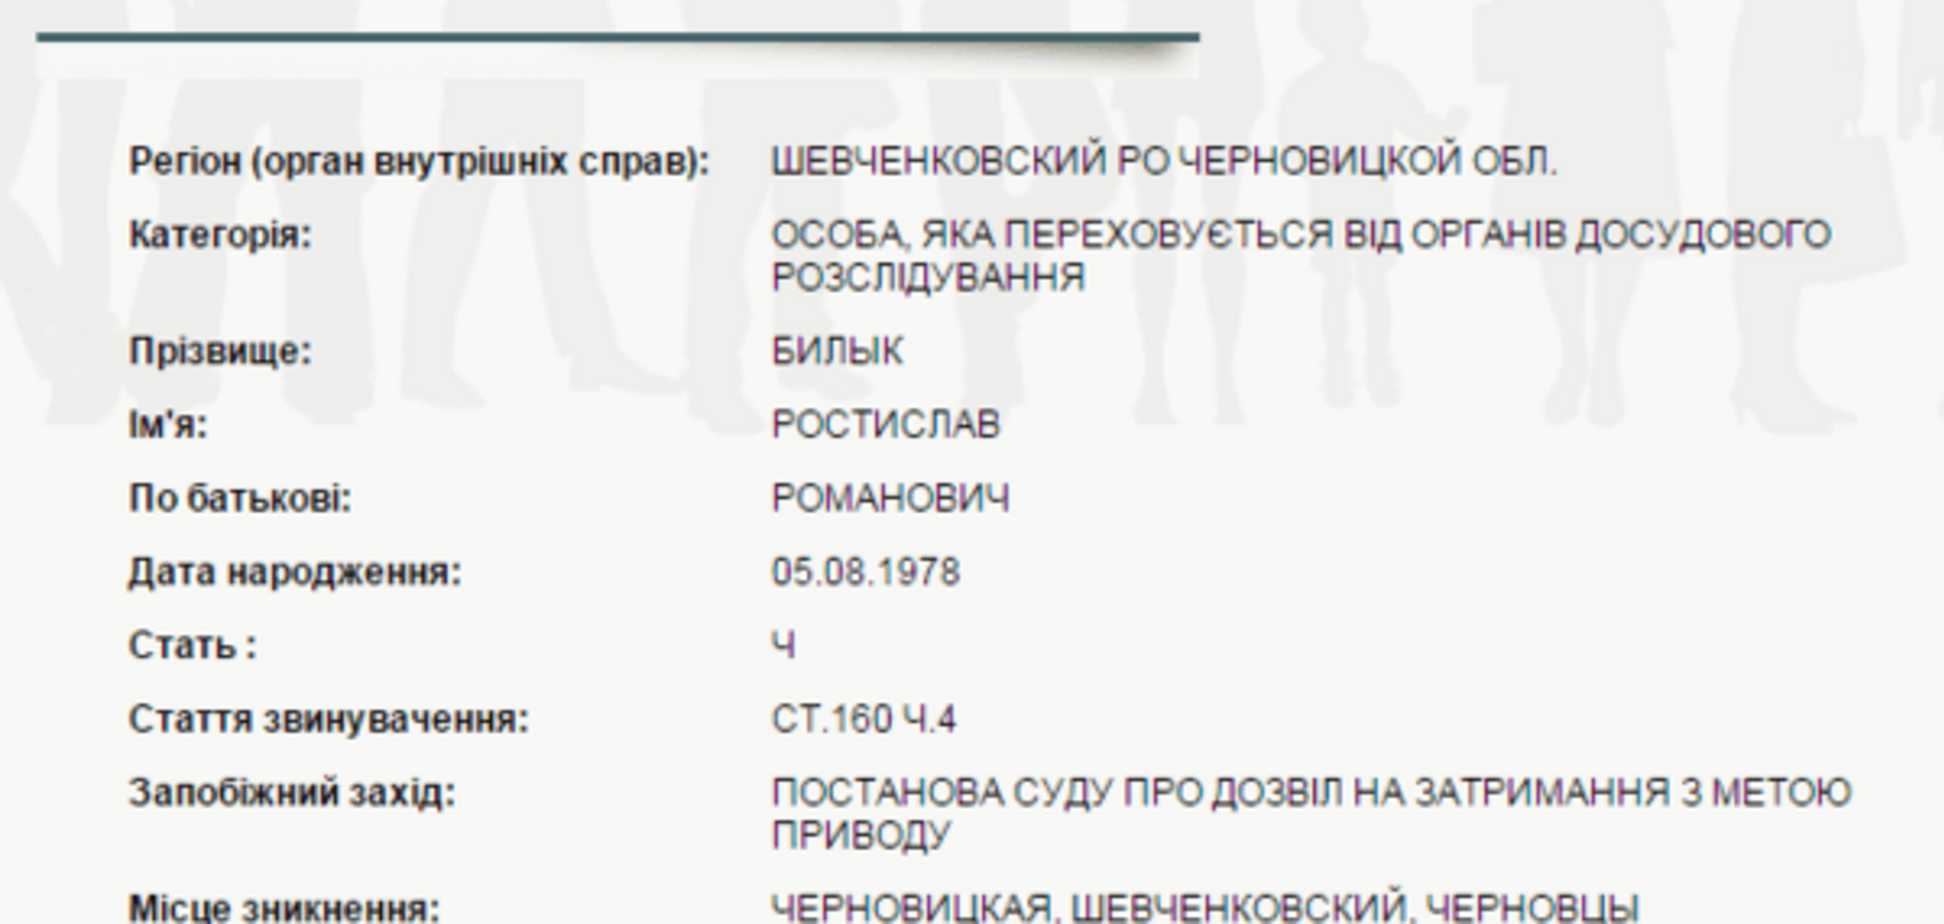 У Чернівцях оголосили в розшук кандидата в депутати